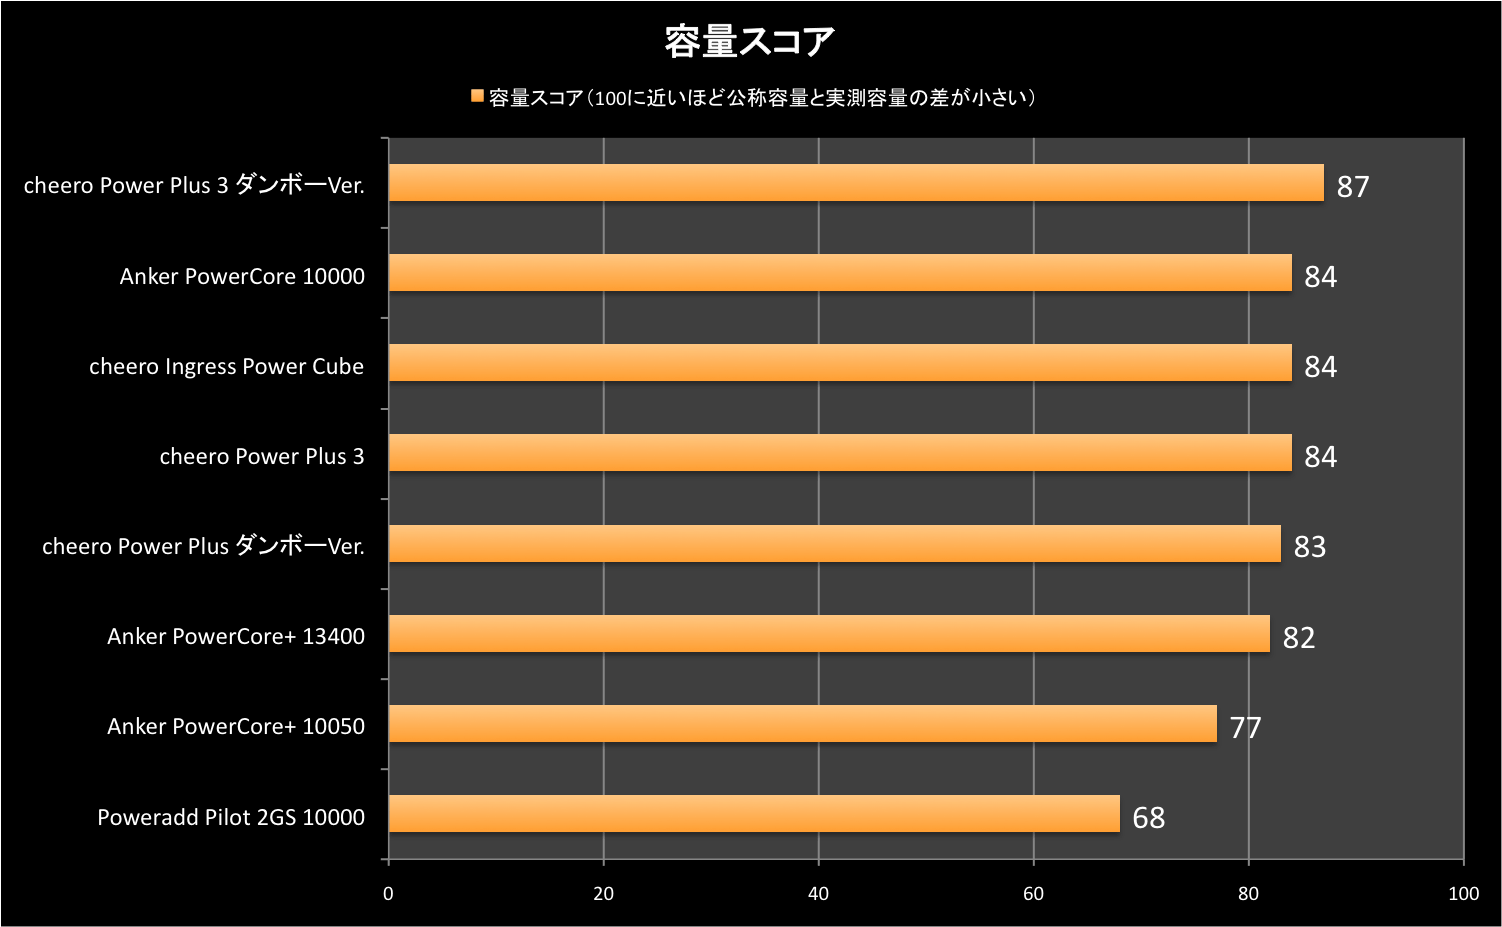 data_score201606-2